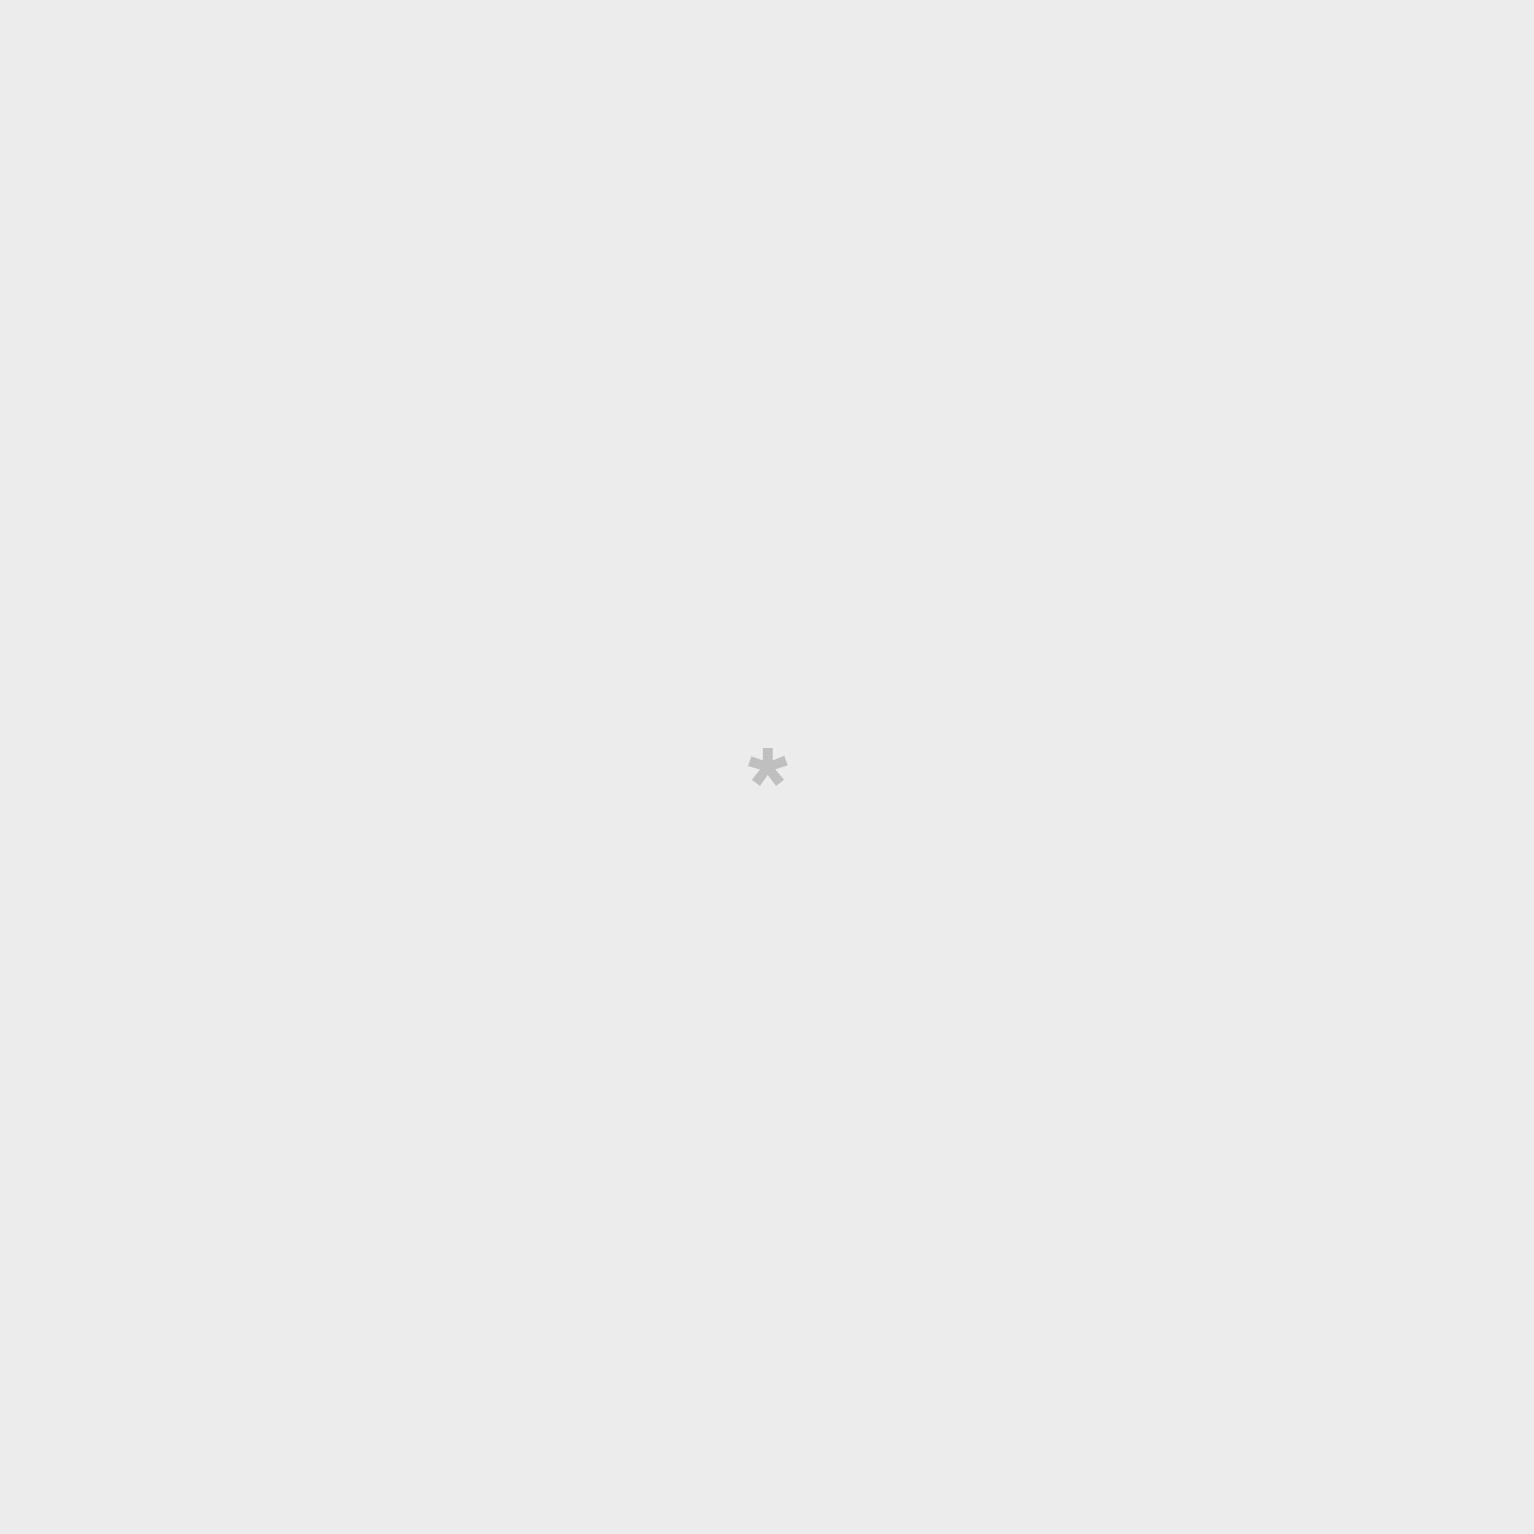 Medium-sized umbrella grey with a cloud pattern